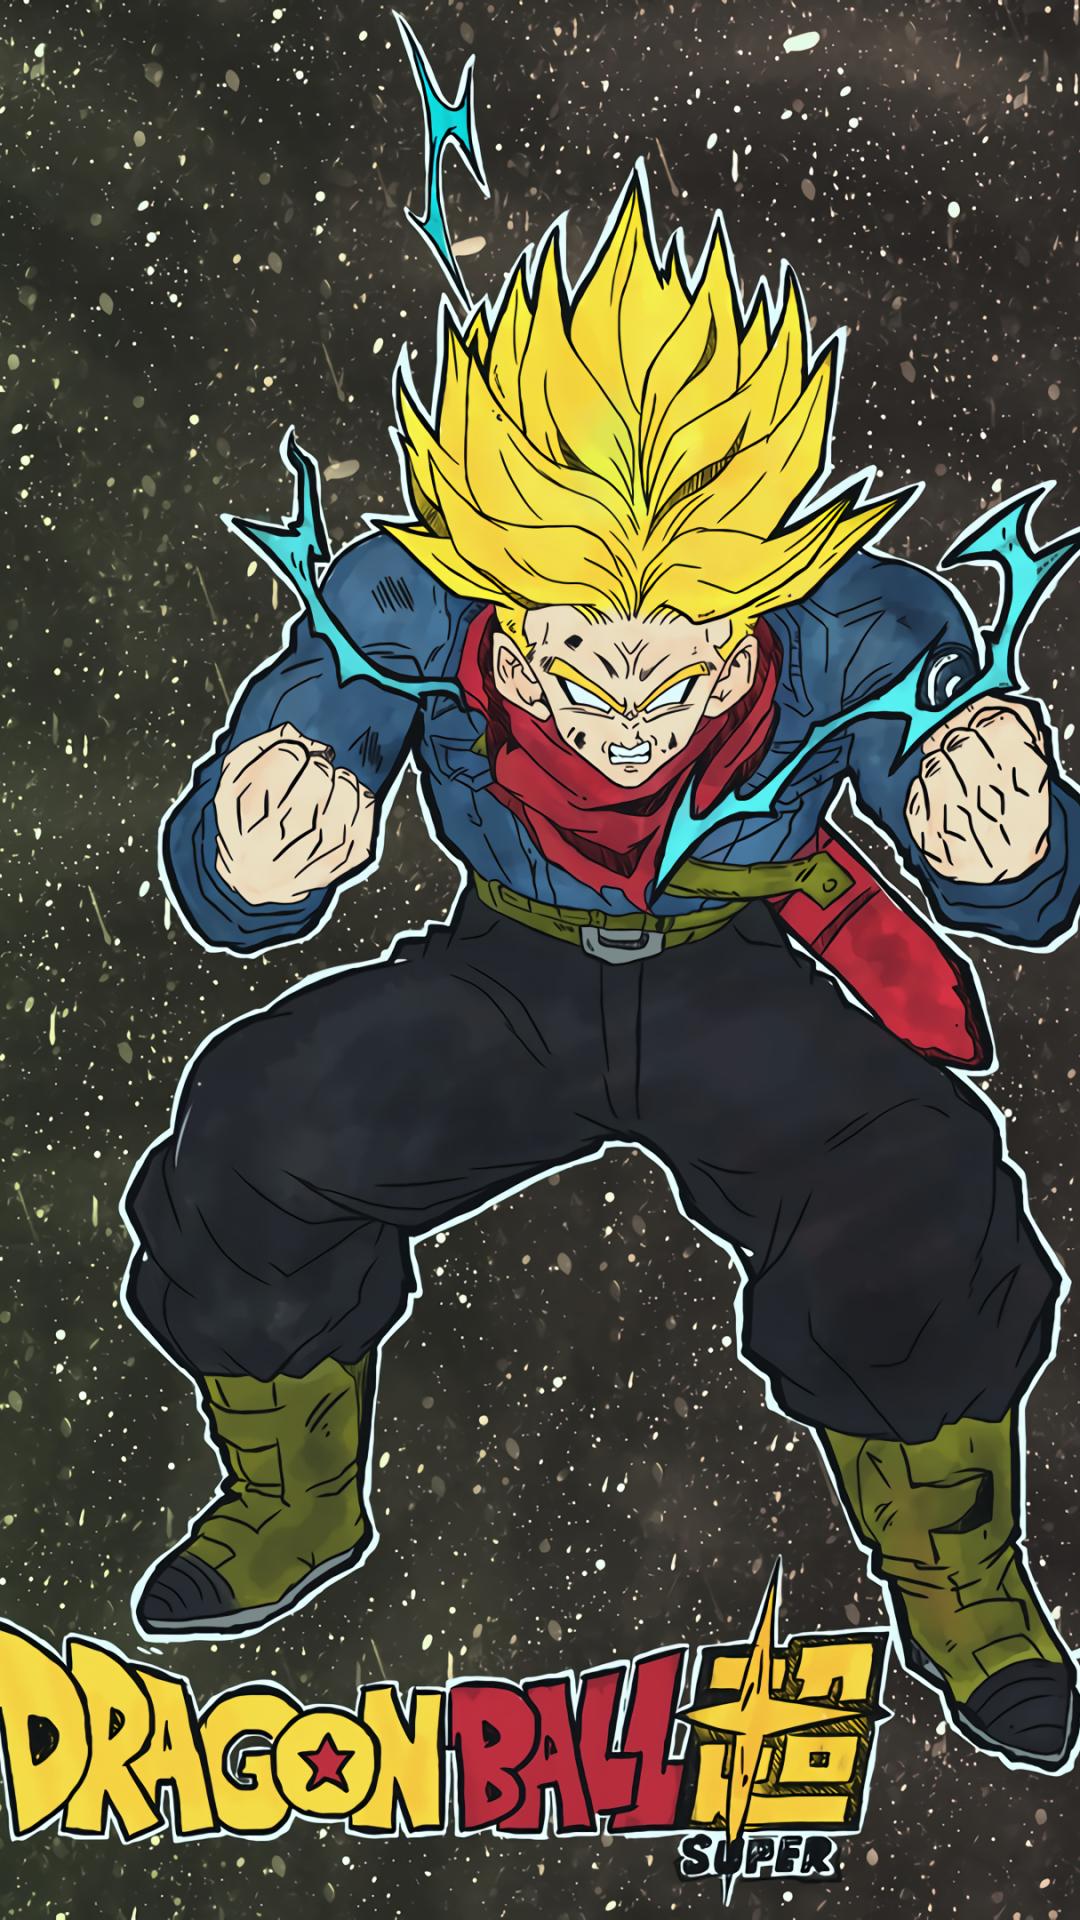 Anime dragon ball super 1080x1920 wallpaper id 708754 mobile abyss - Dragon ball super wallpaper 1080x1920 ...